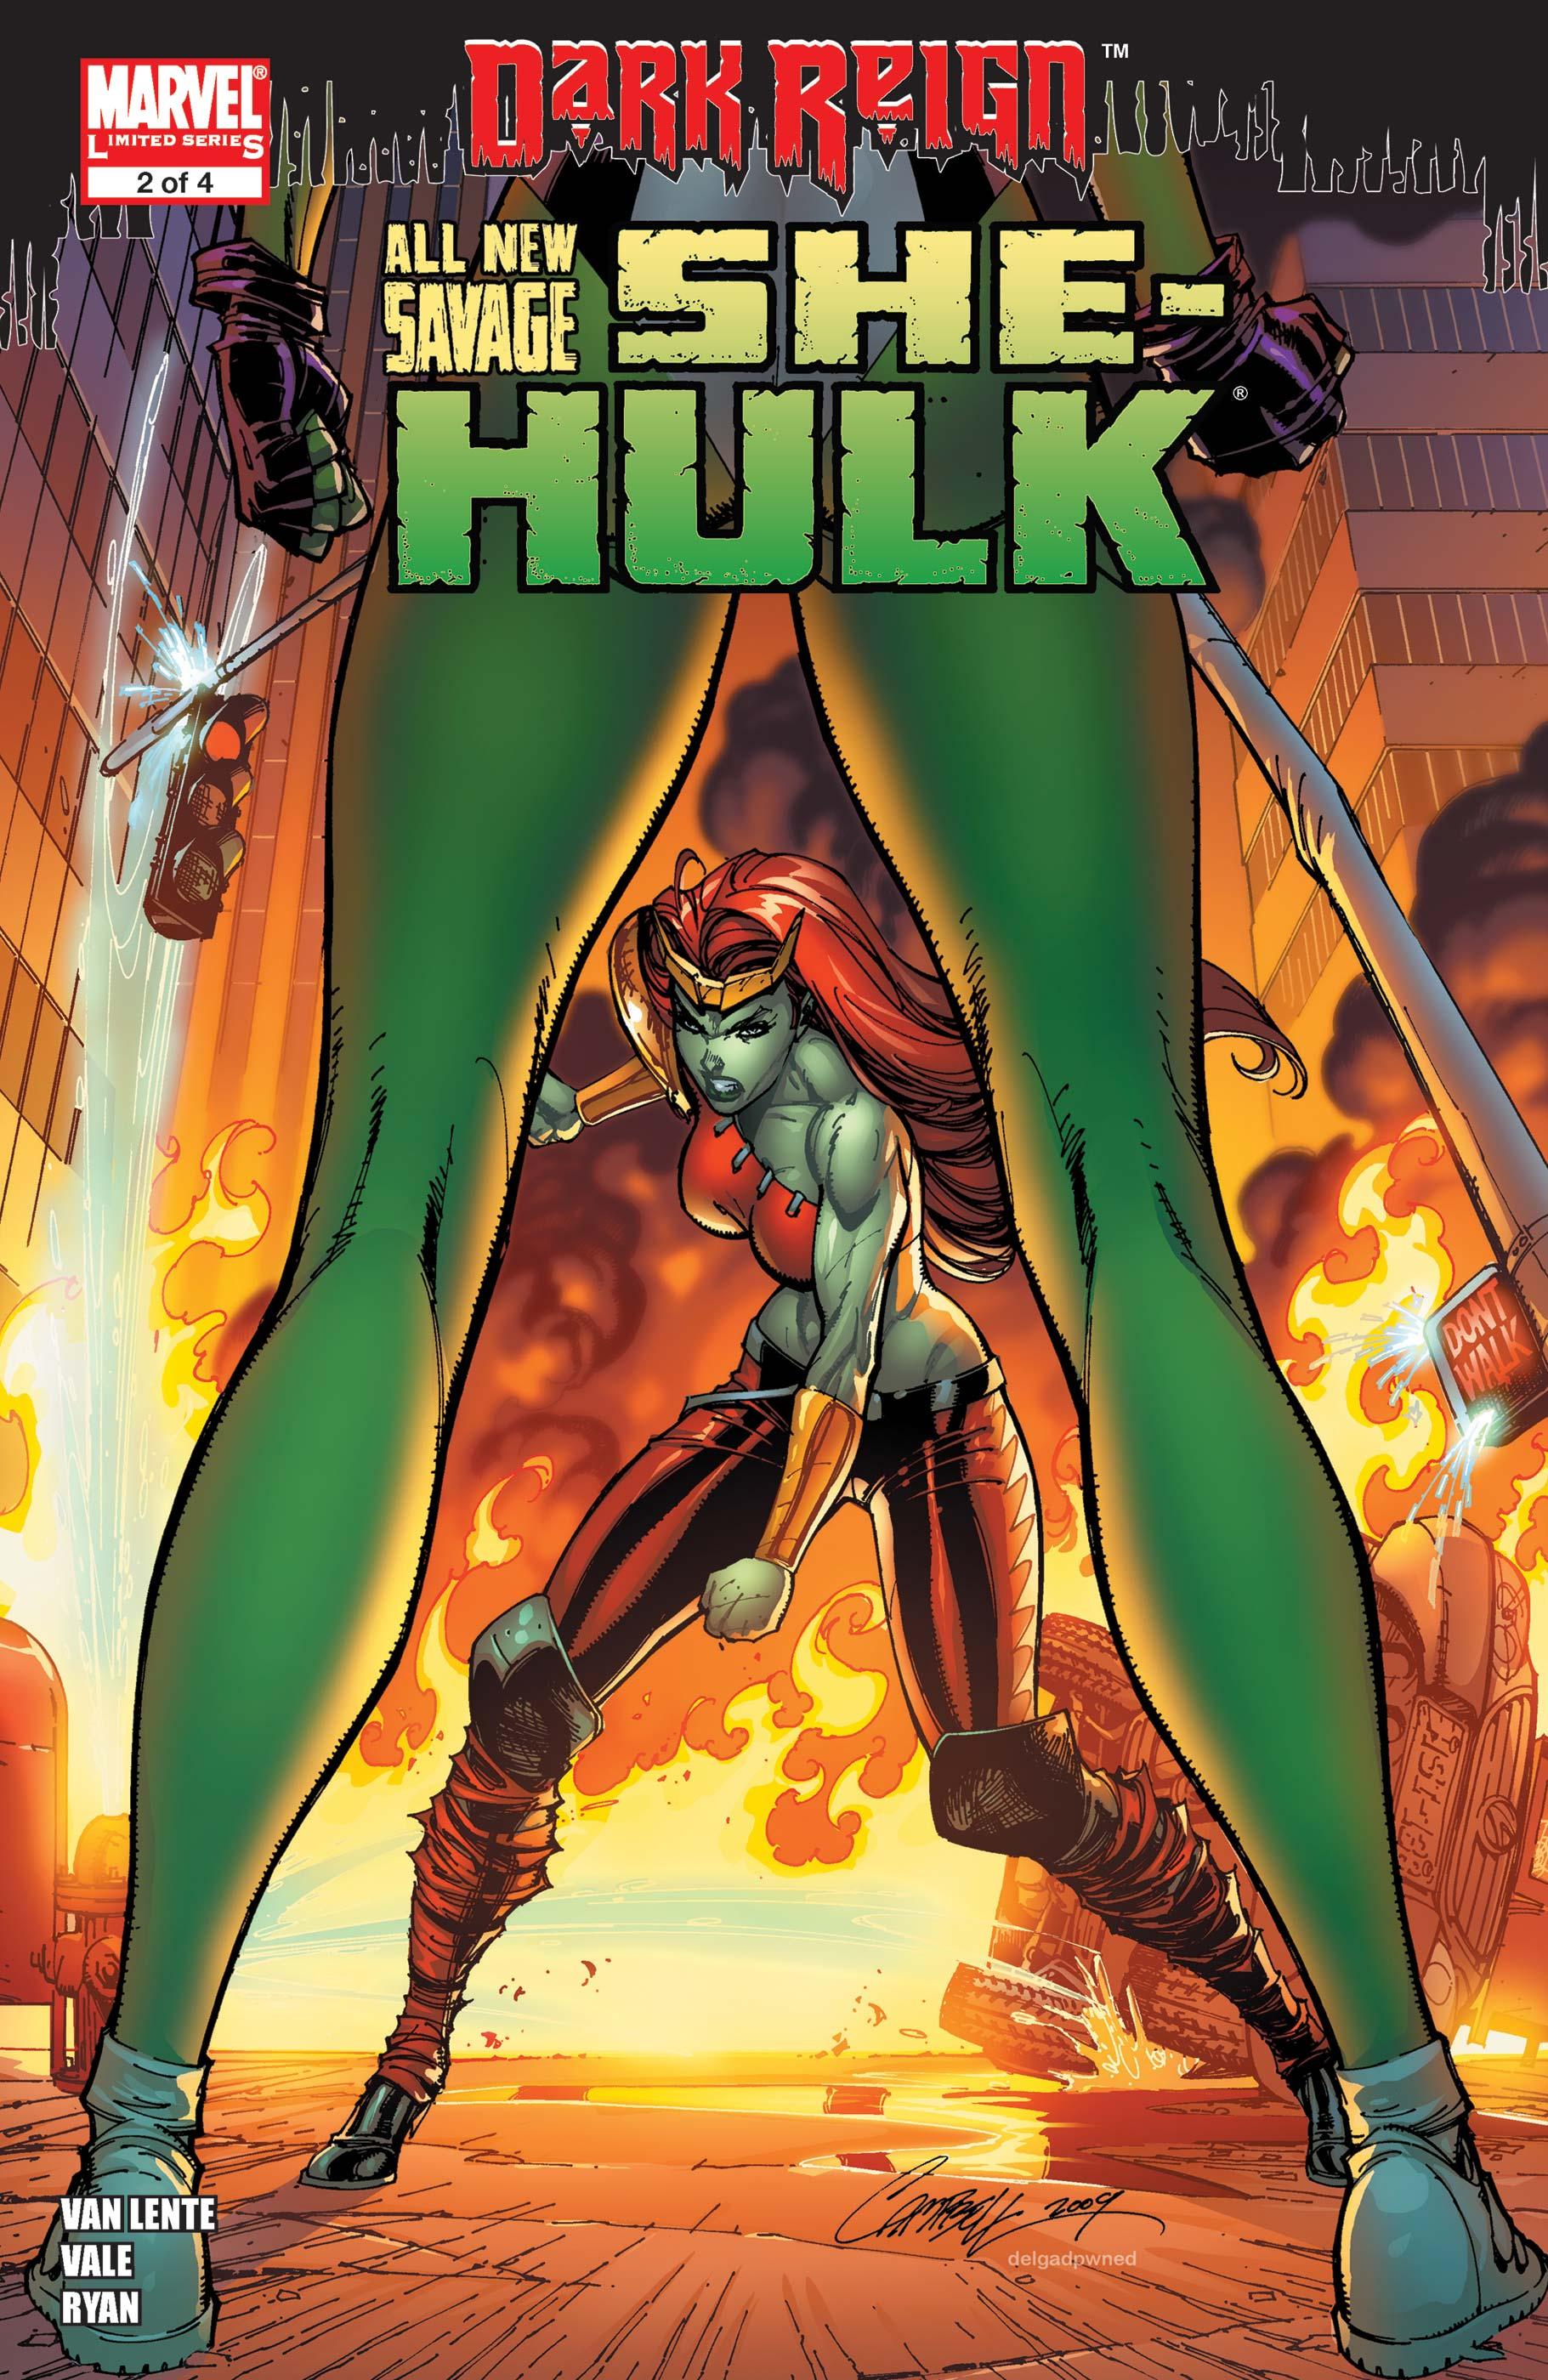 All-New Savage She-Hulk (2009) #2